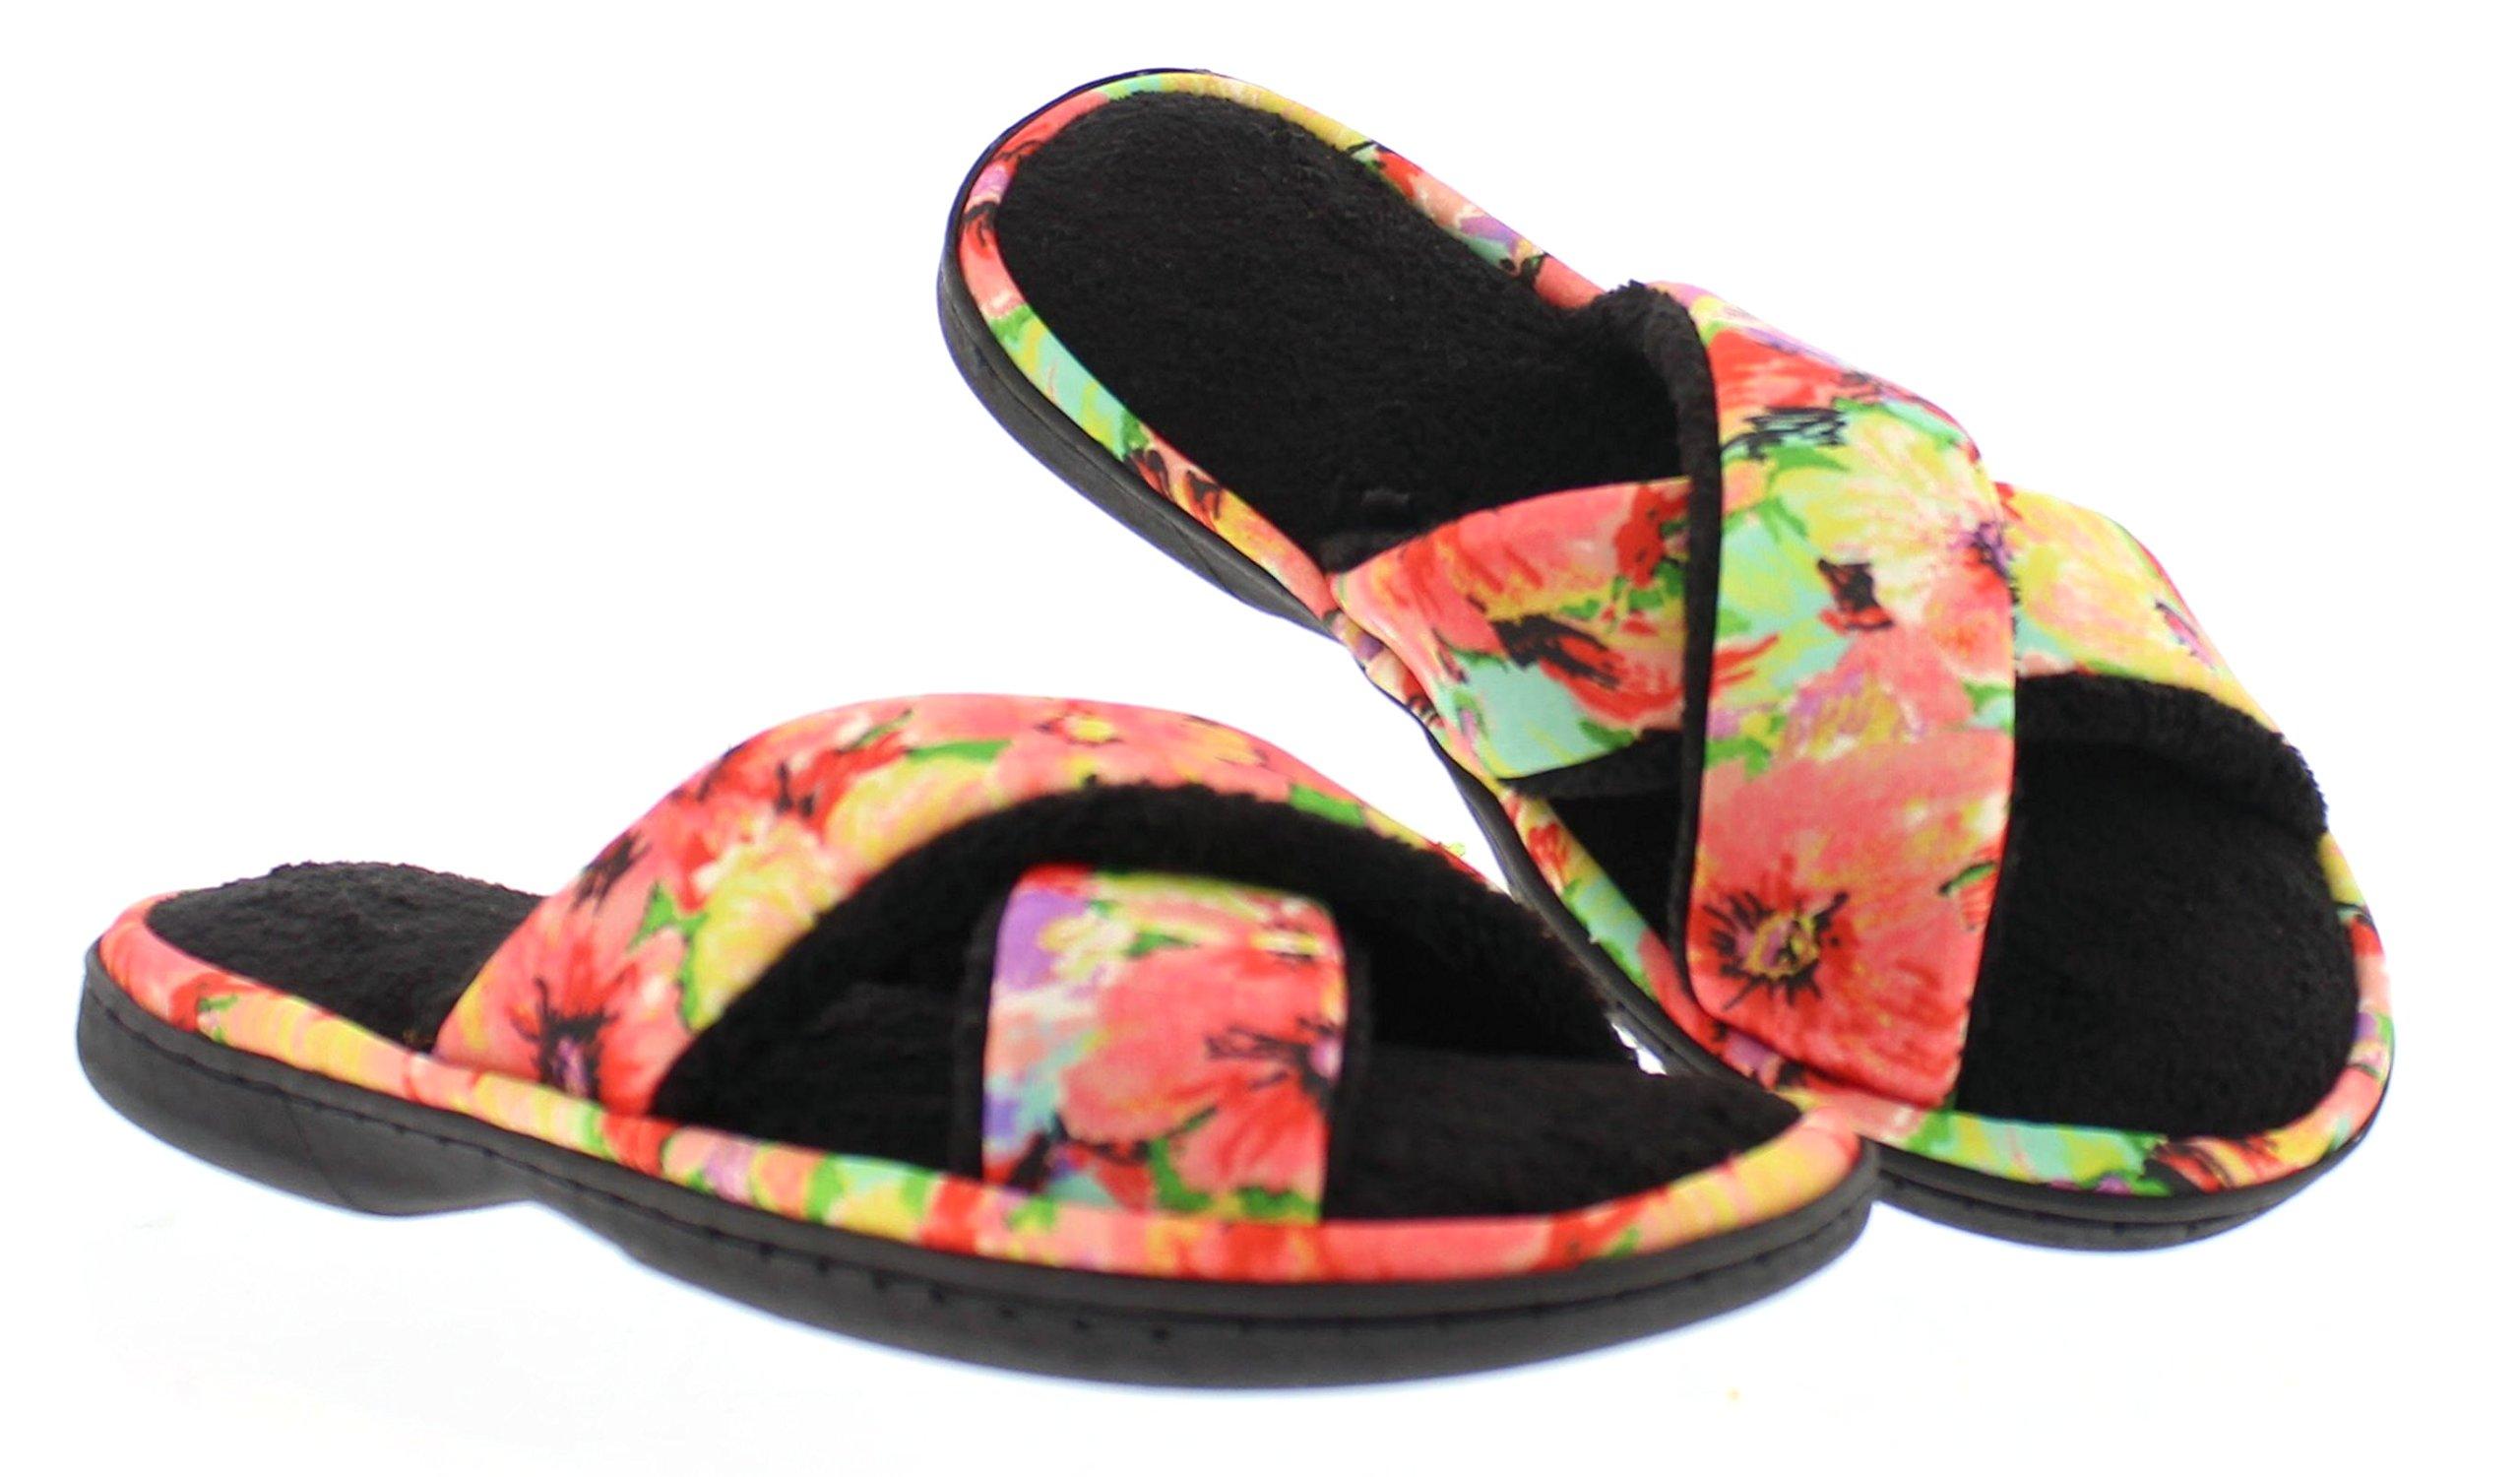 Ramira Womens Open Toe House Slippers Slides,Soft Memory Foam Flip Flop Slipper Summer Indoor Outdoor UseBlack XL 10-11 US